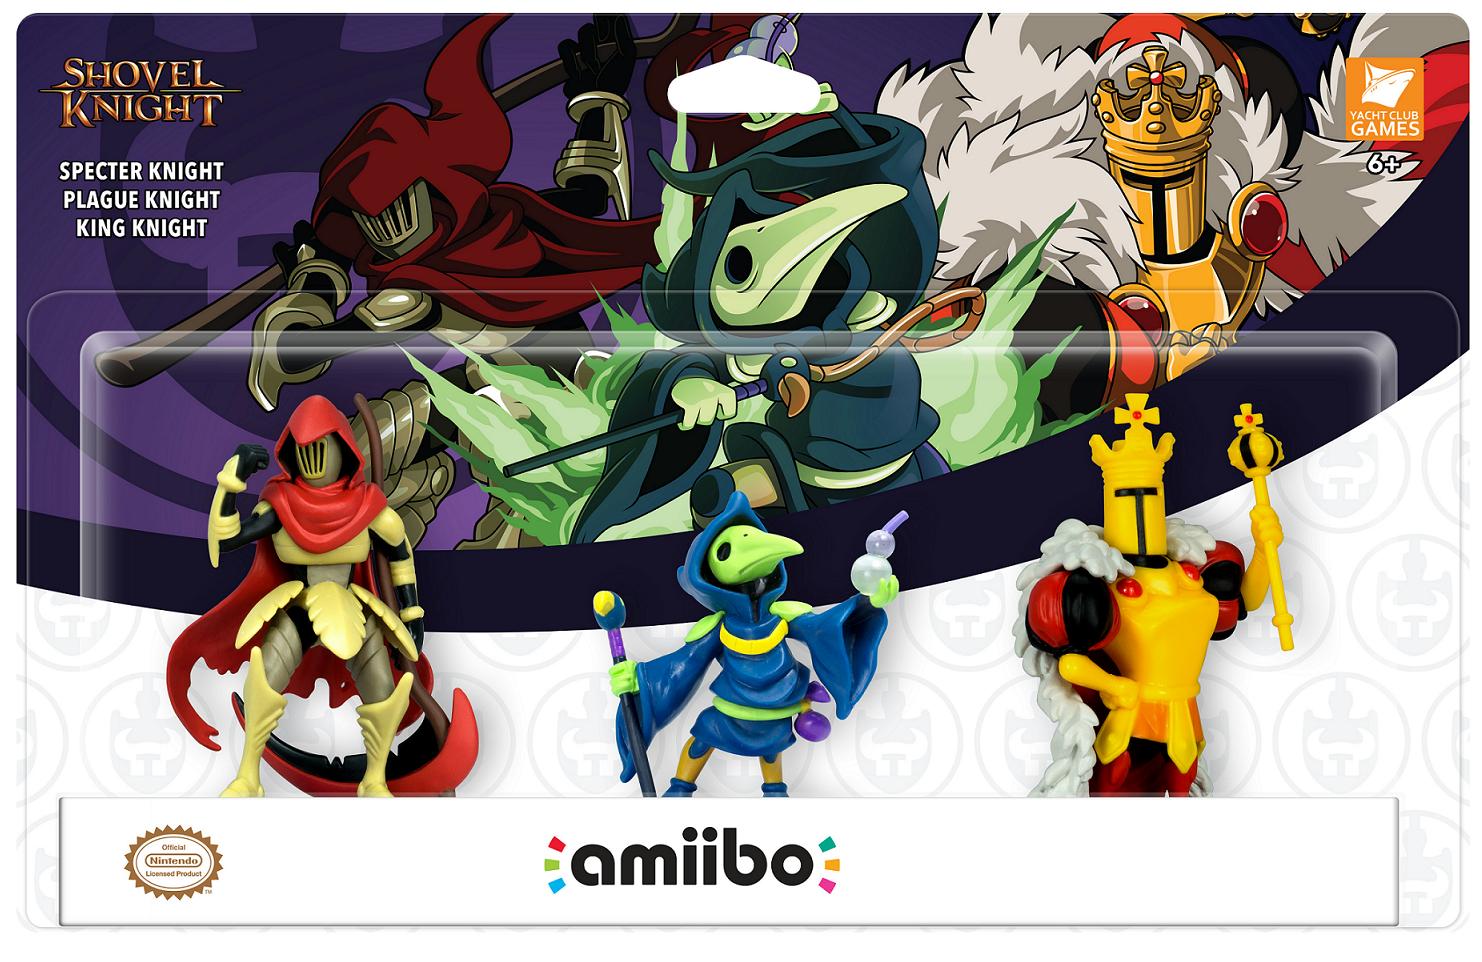 【Nintendo Nindies@Night】『ショベルナイト』の新しいamiiboなどの詳細が発表